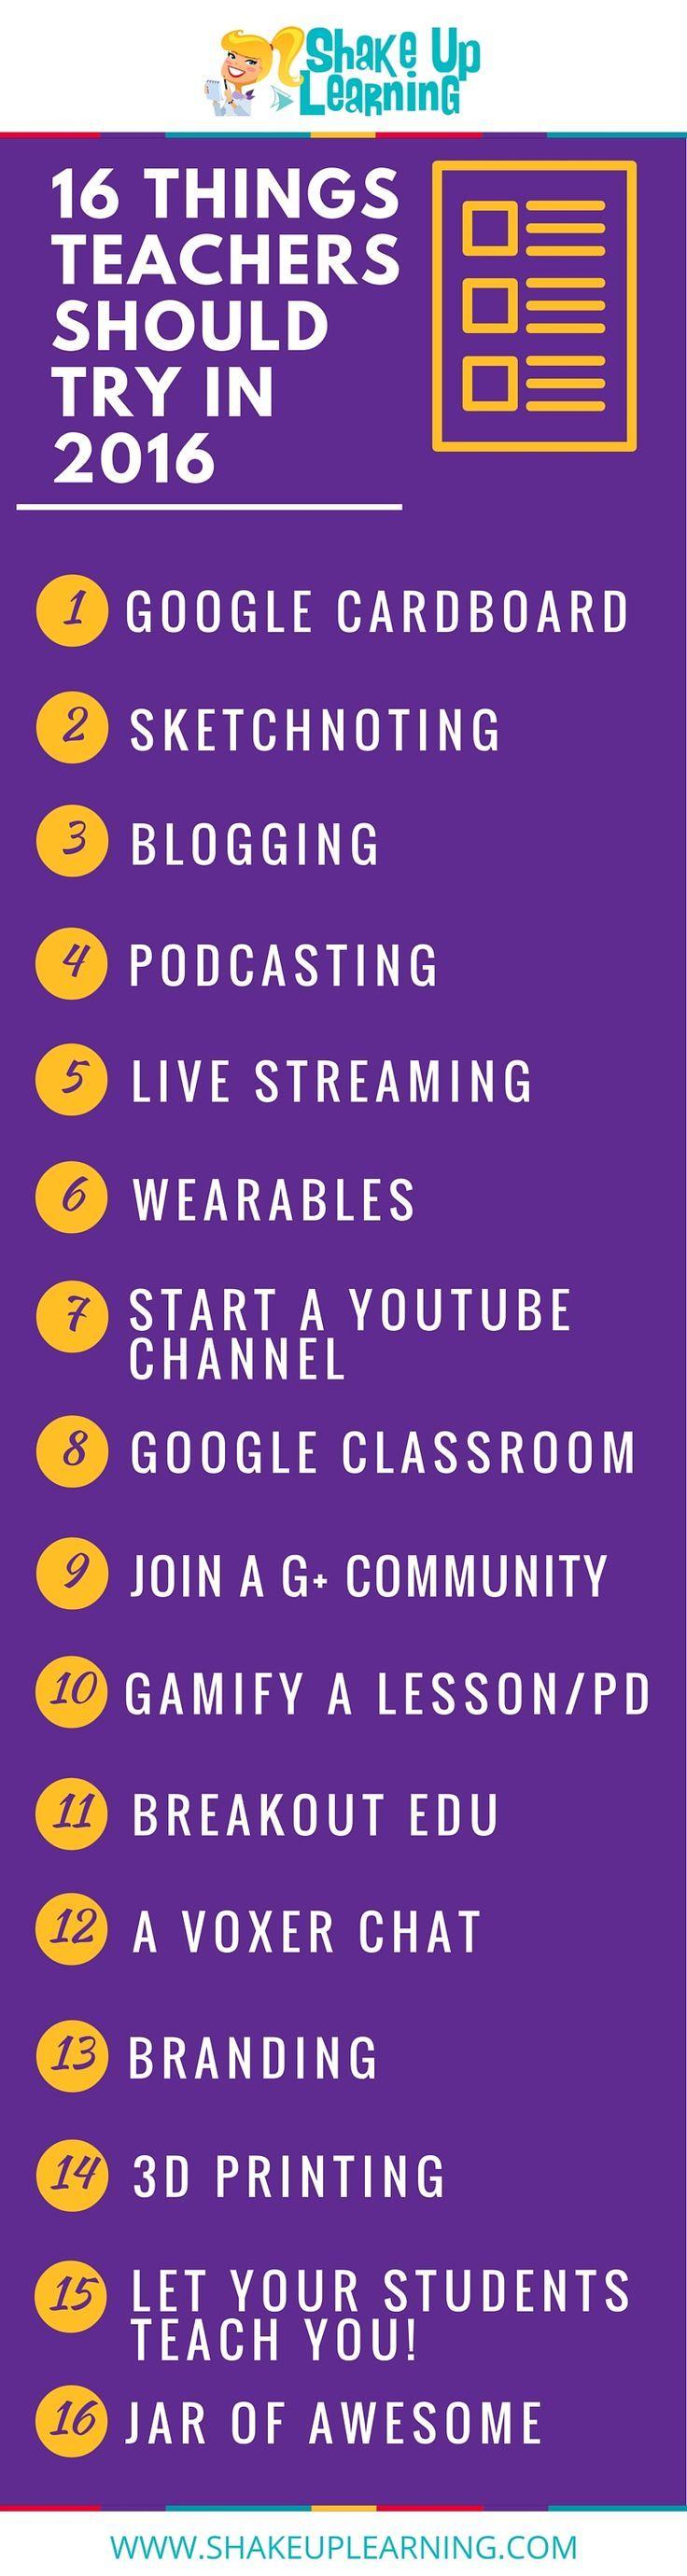 16 Things Teachers Should Try in 2016 | www.ShakeUpLearning.com | #edtech #edchat #gafe